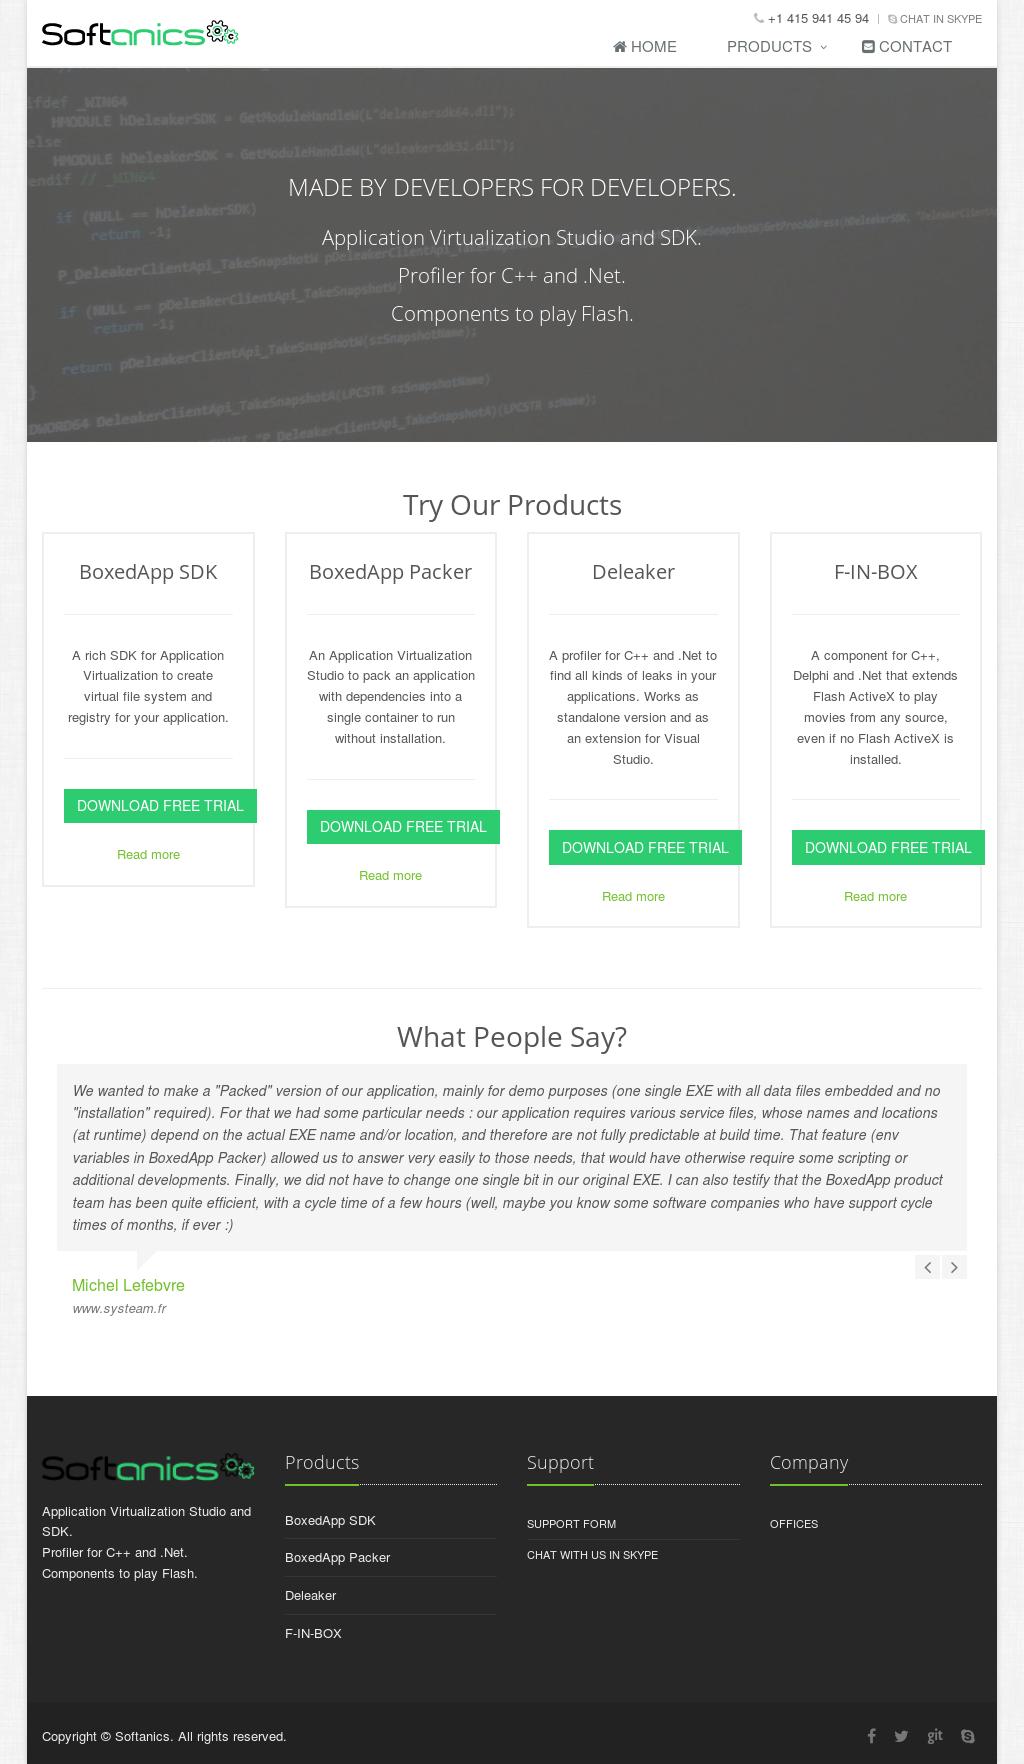 Softanics Competitors, Revenue and Employees - Owler Company